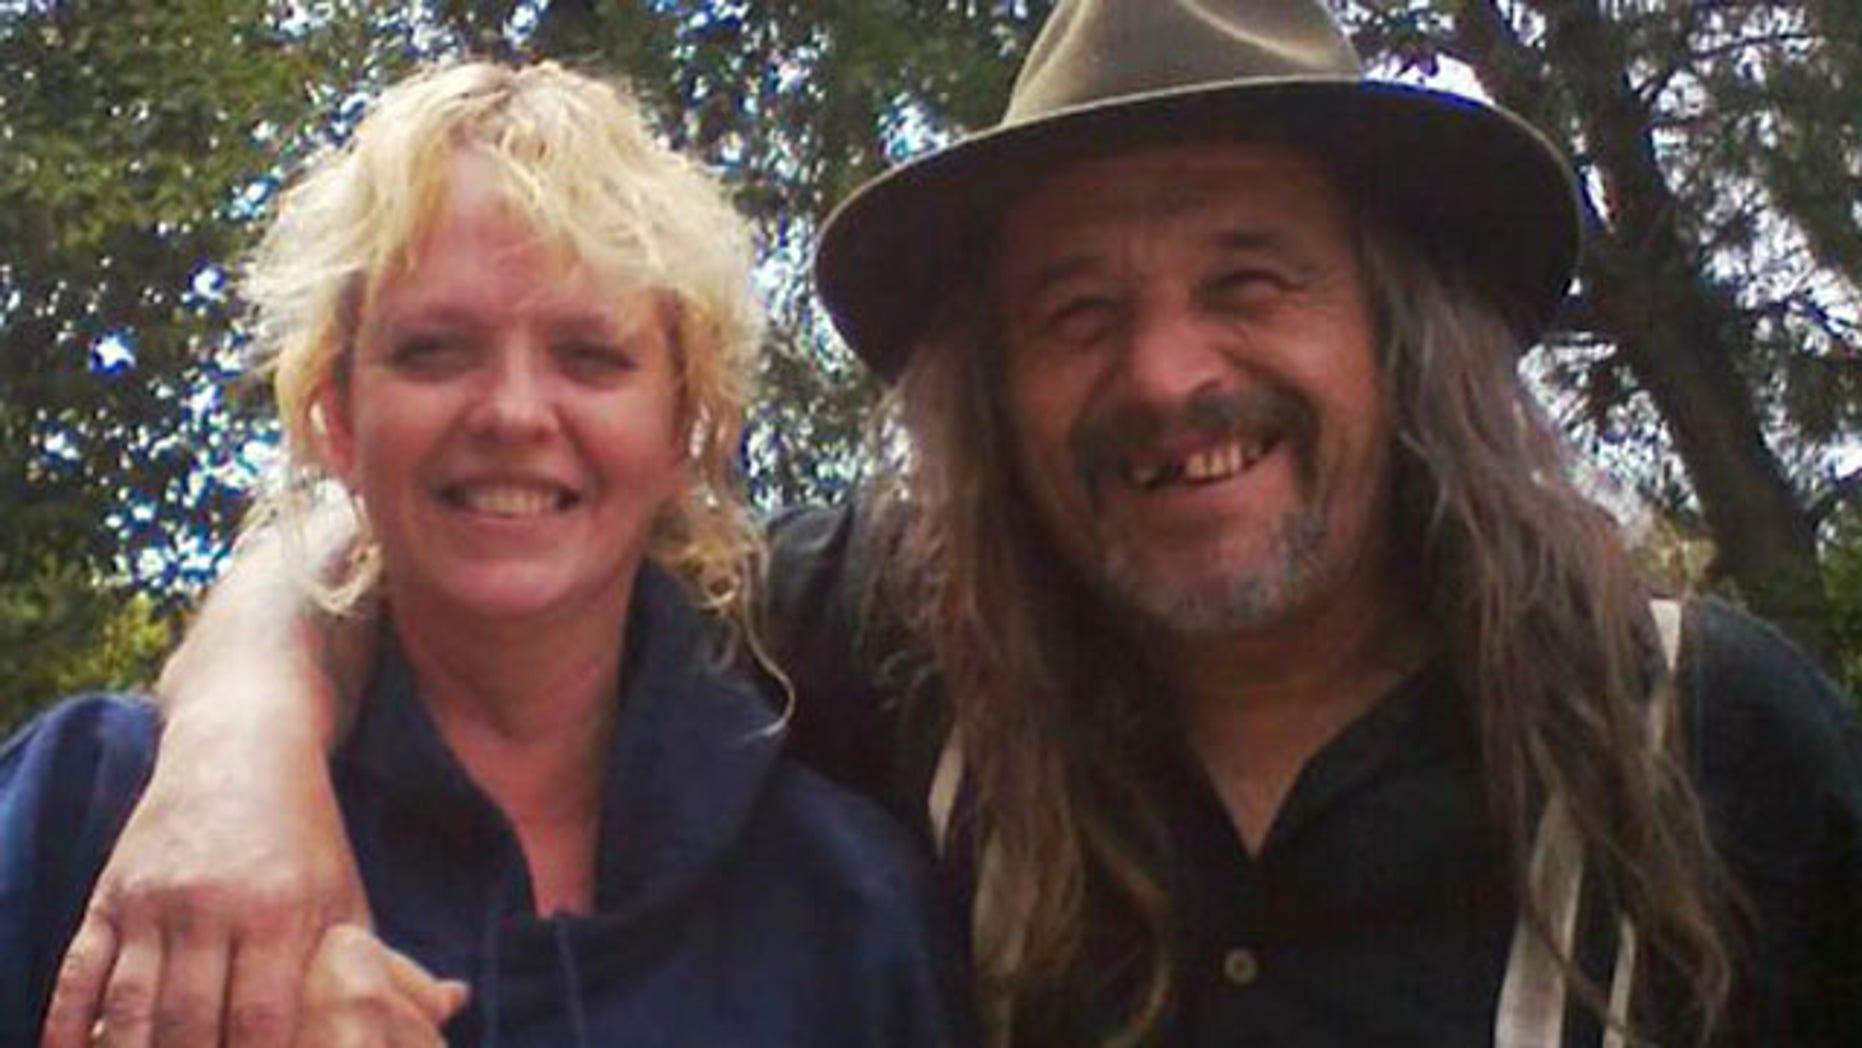 FILE: This photo provided by Karanda Williams shows Daniel and Belinda Conne.